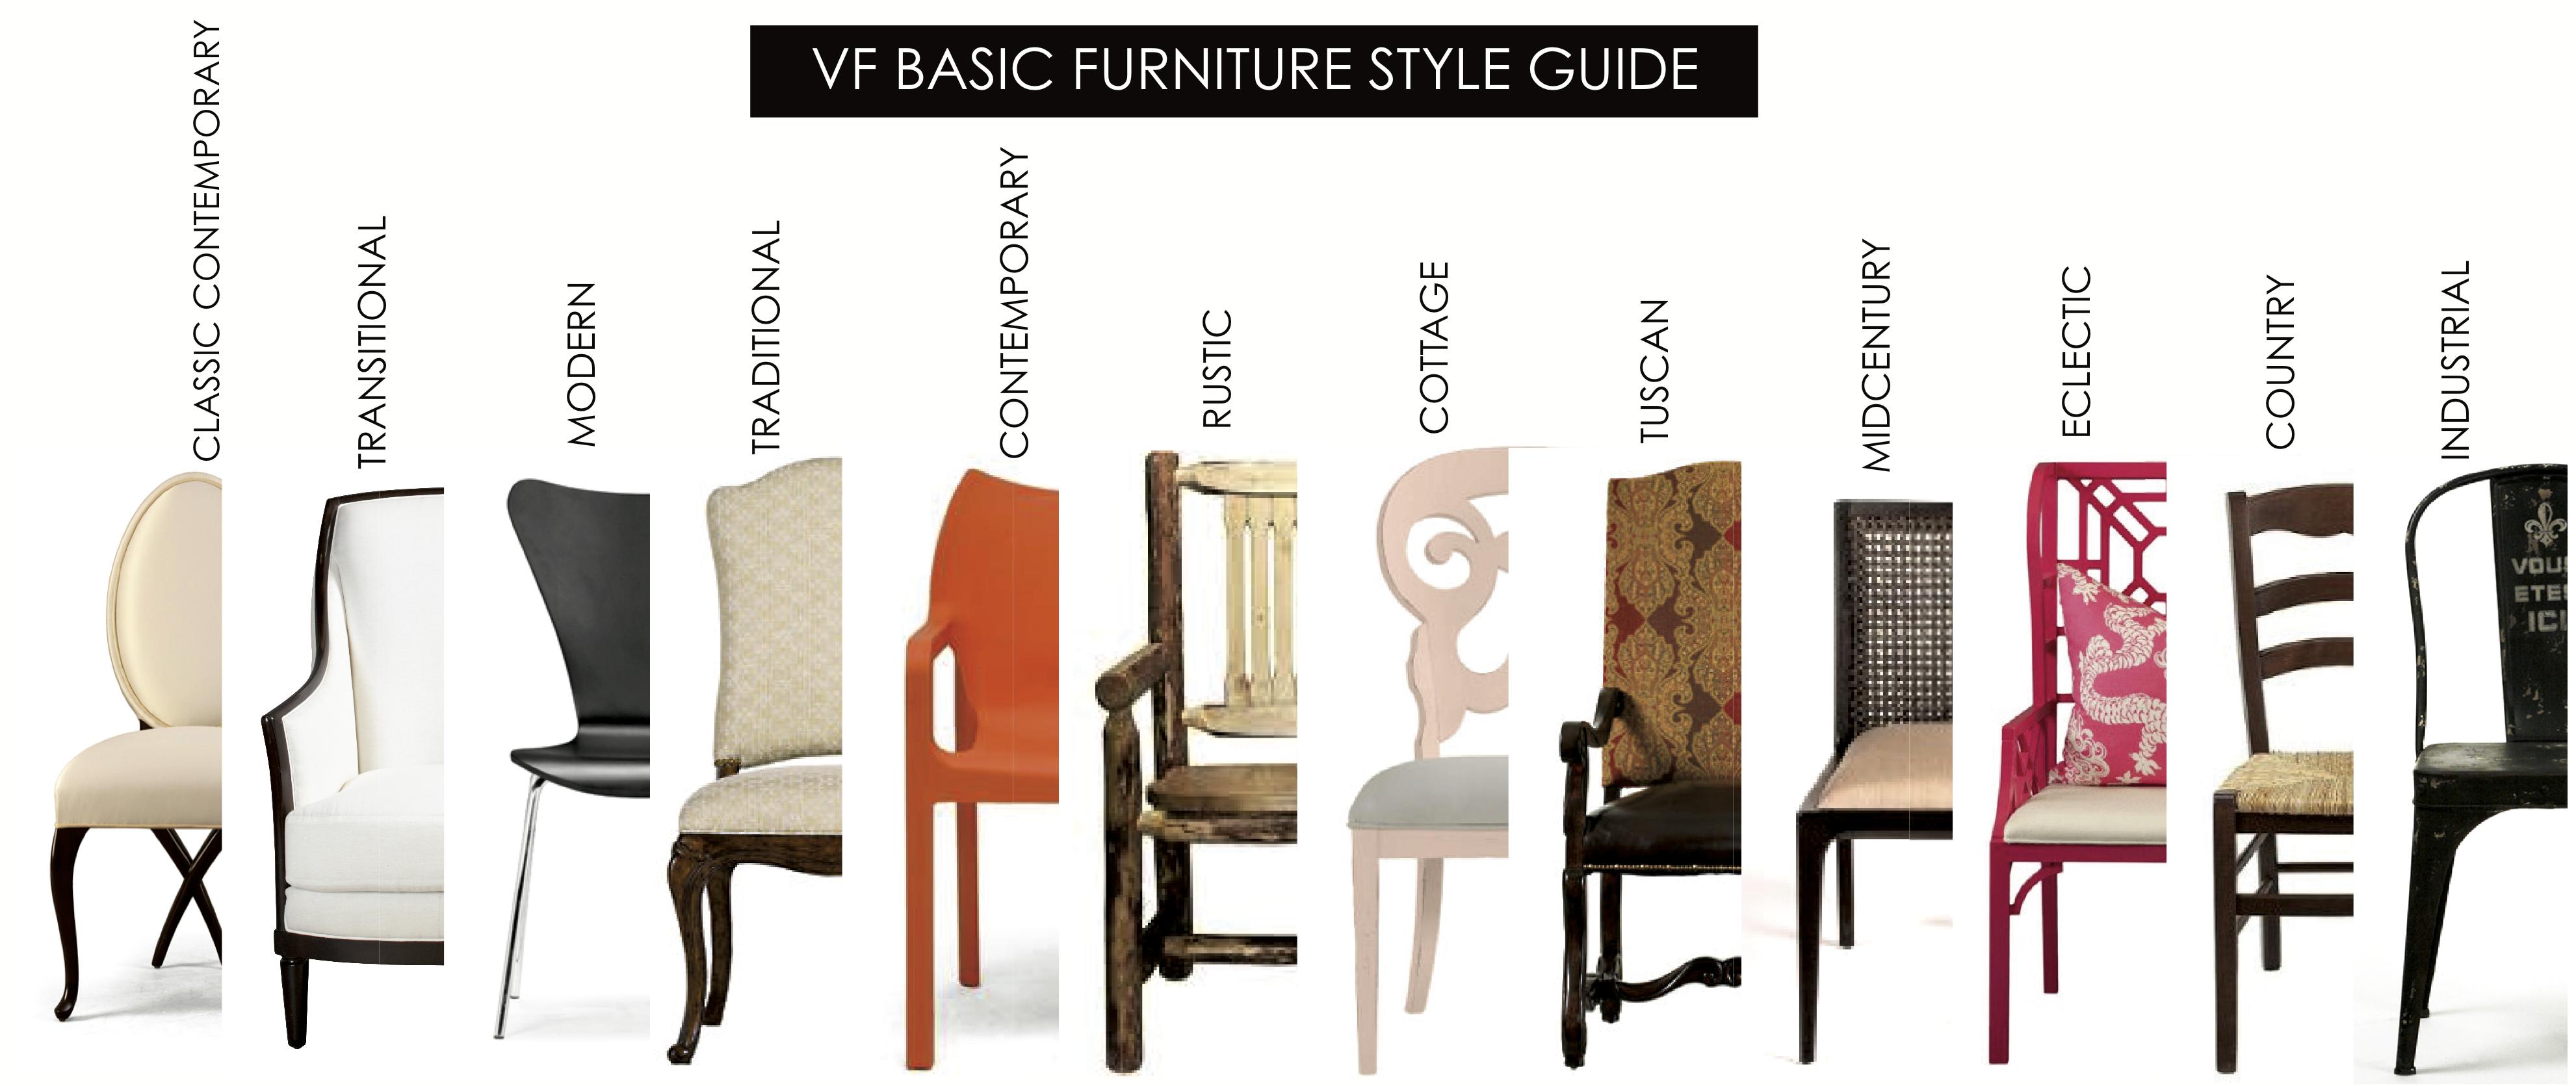 furniture style guide. Furniture Style Basics 101 \u2013 VF Basic Guide U